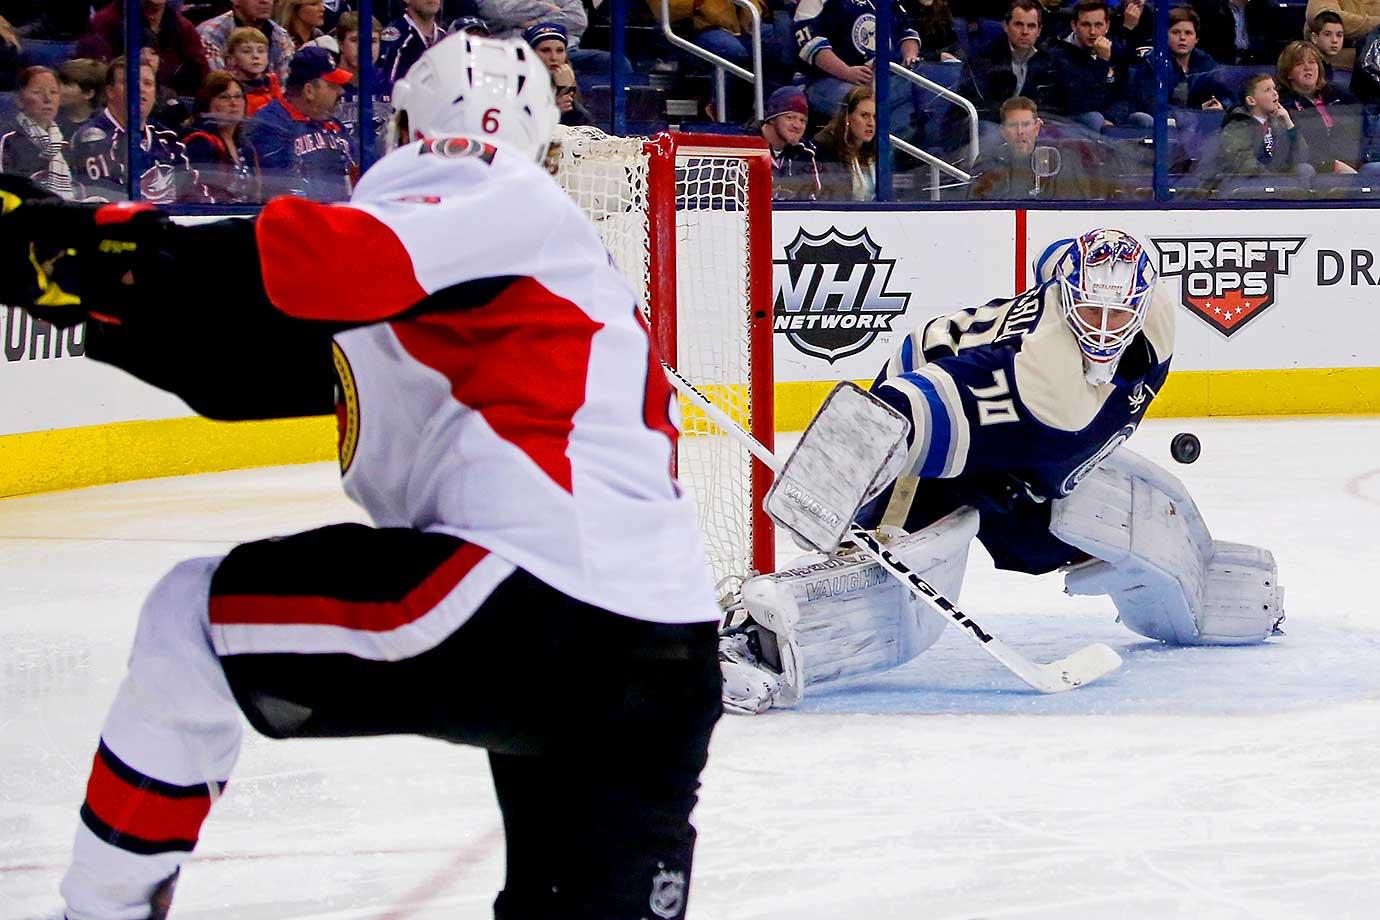 JJoonas Korpisalo of the Columbus Blue Jackets blocks a shot from Bobby Ryan of the Ottawa Senators.